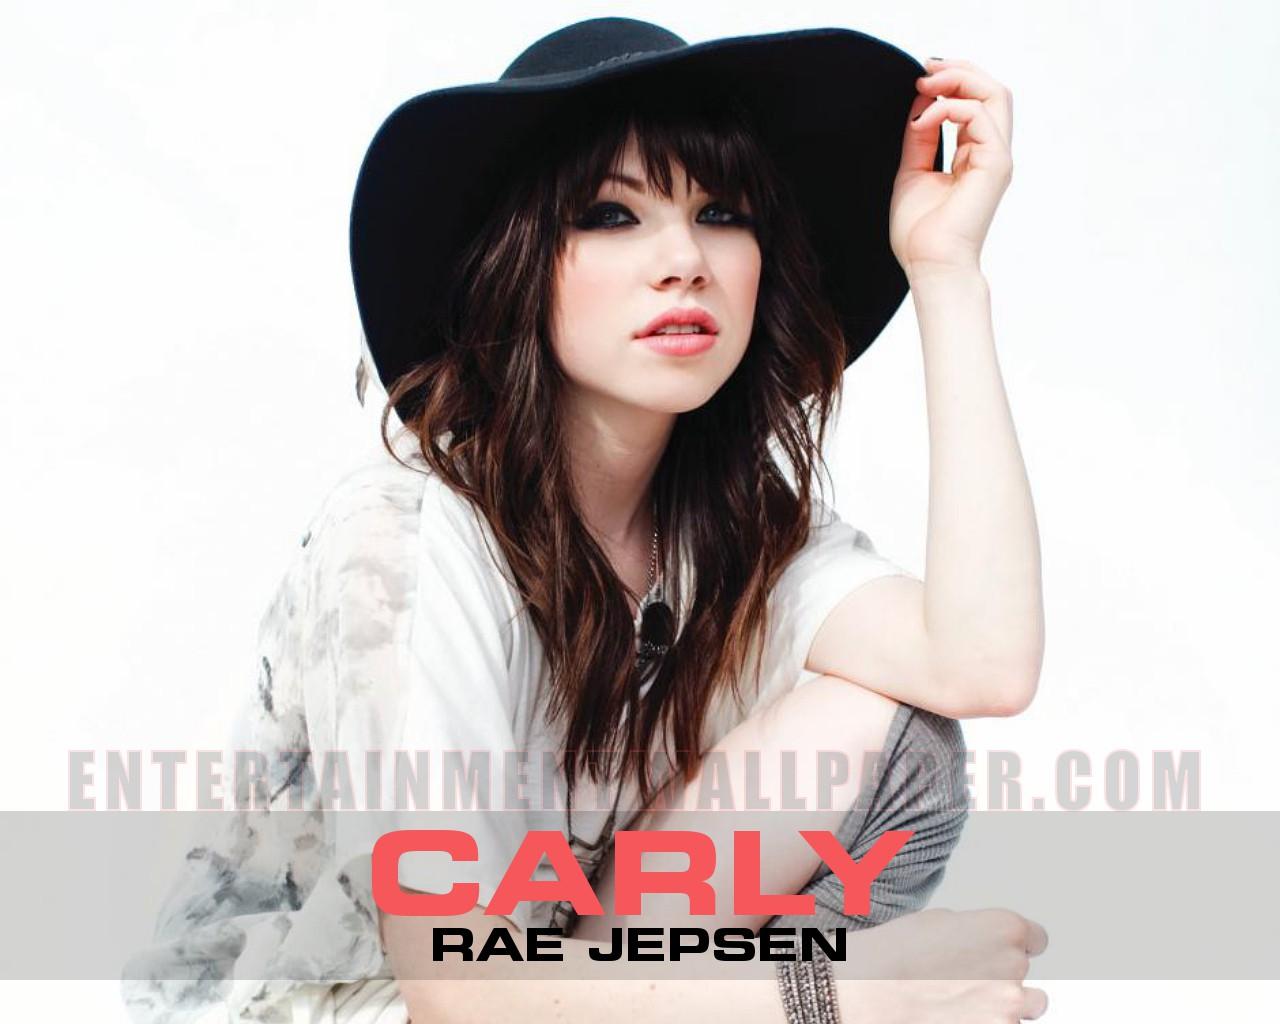 Carly Rae Jepsen carly rae jepsen wallpaper